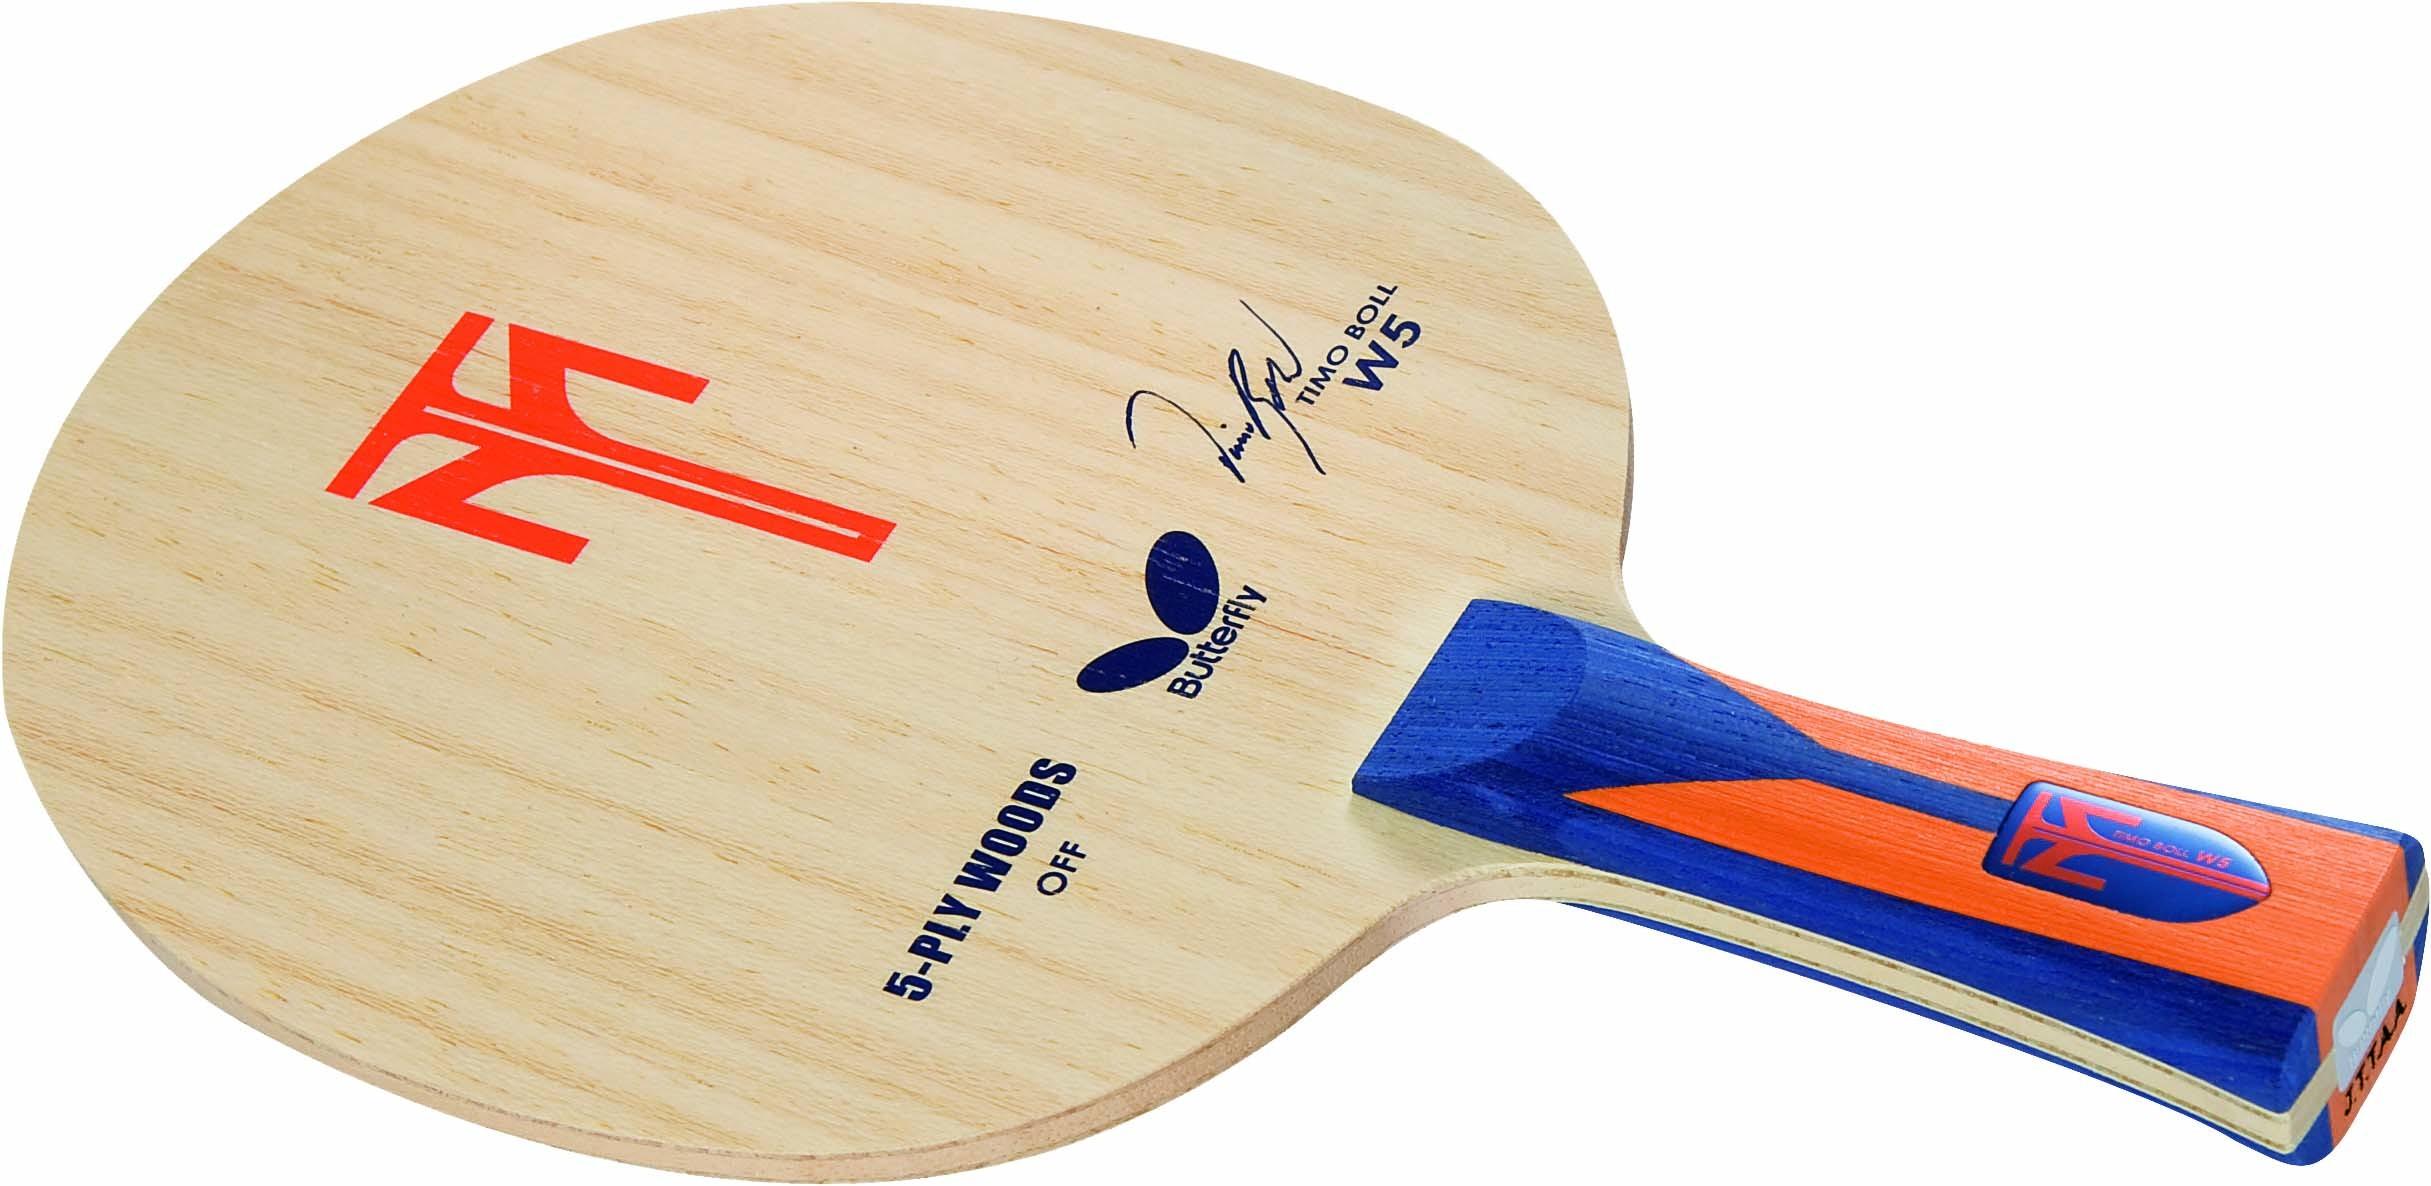 Butterfly timo boll w5 - Butterfly tennis de table france ...